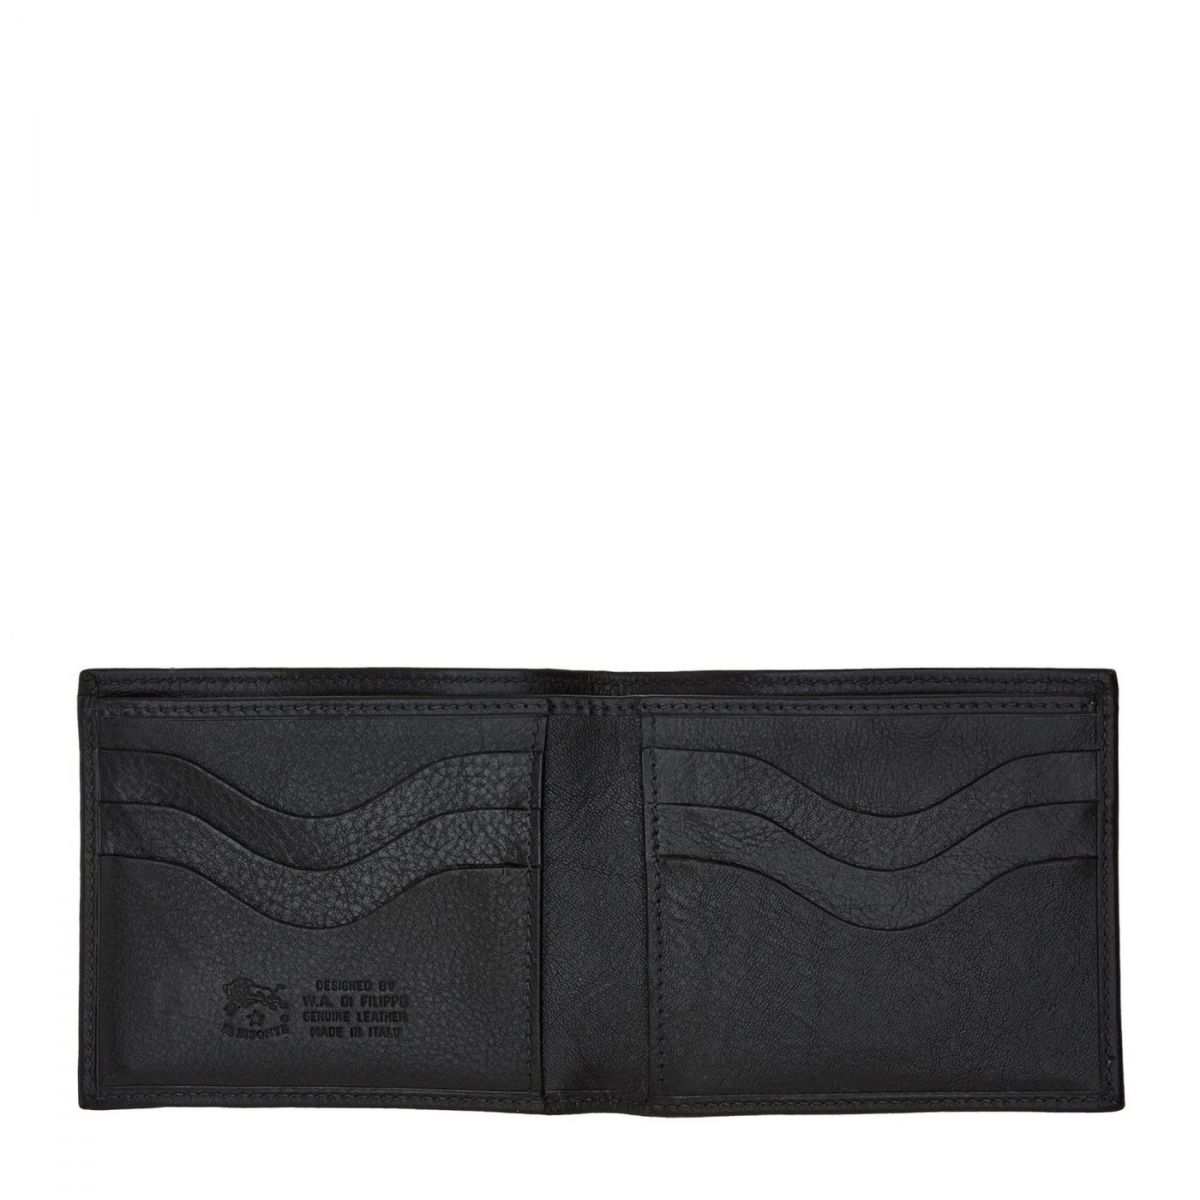 Men's Bi-Fold Wallet  in Cowhide Double Leather SBW005 color Black | Details